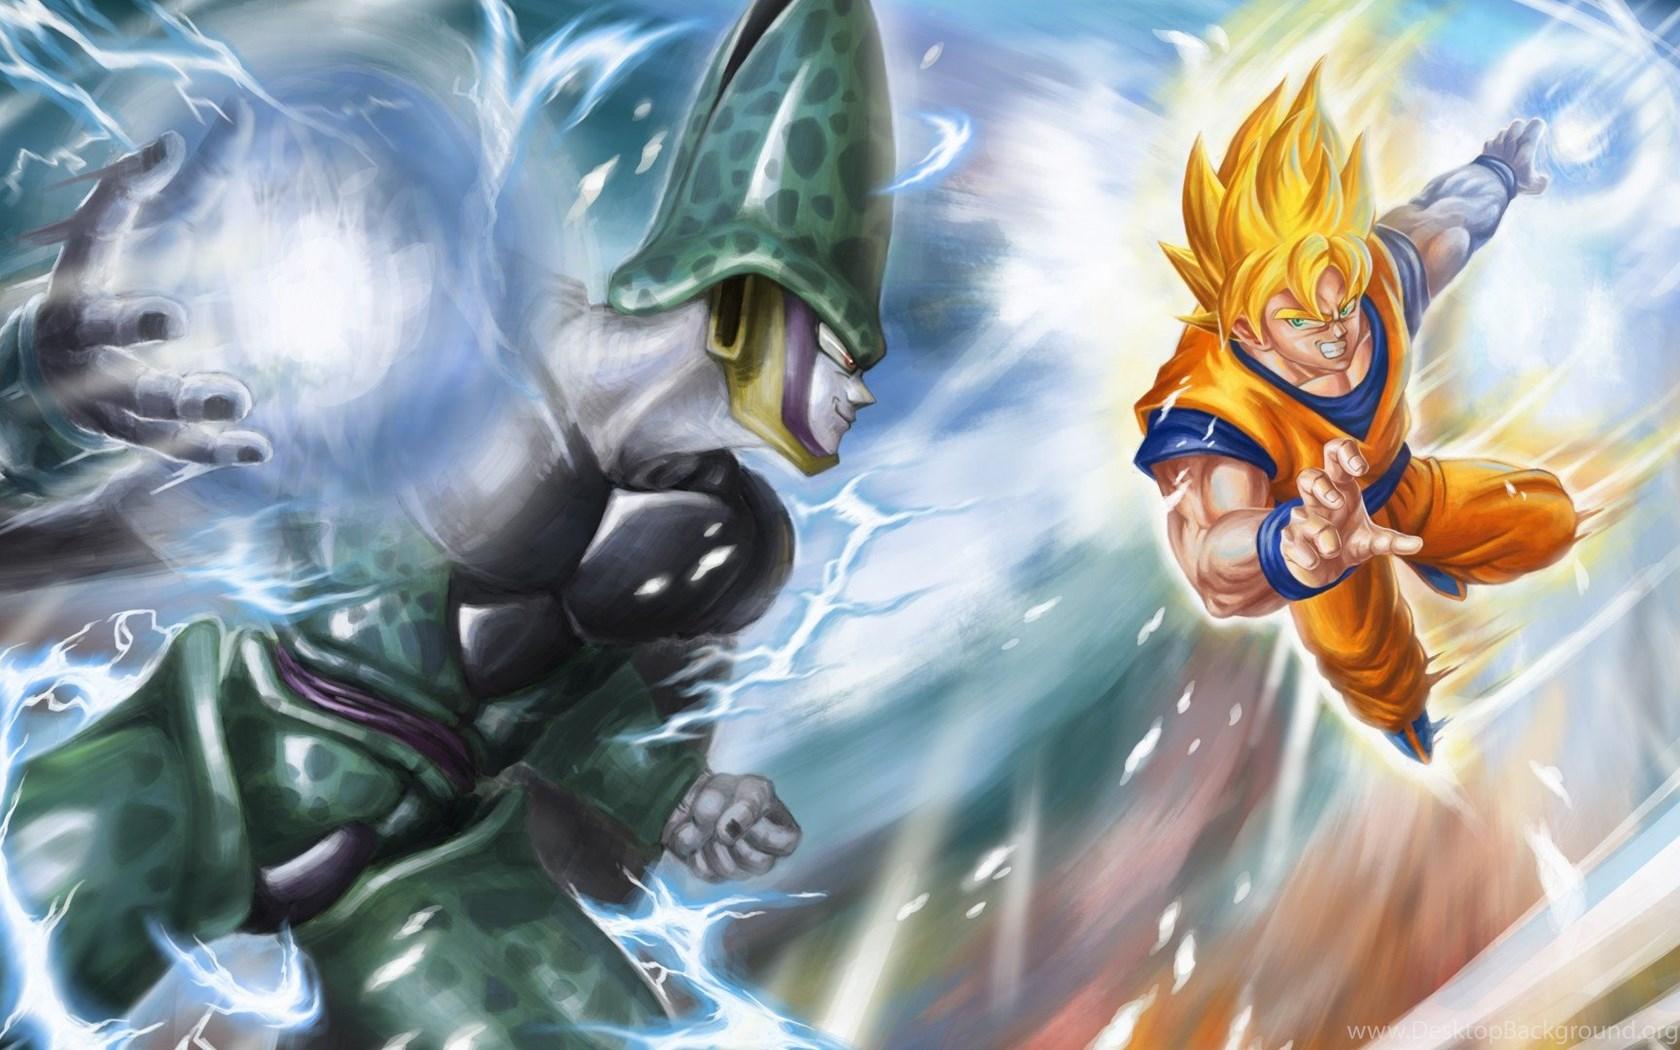 Super Saiyan Live Wallpaper Iphone X Hd Goku Vs Cell Dragon Ball Z Hd 1080p Wallpapers Full